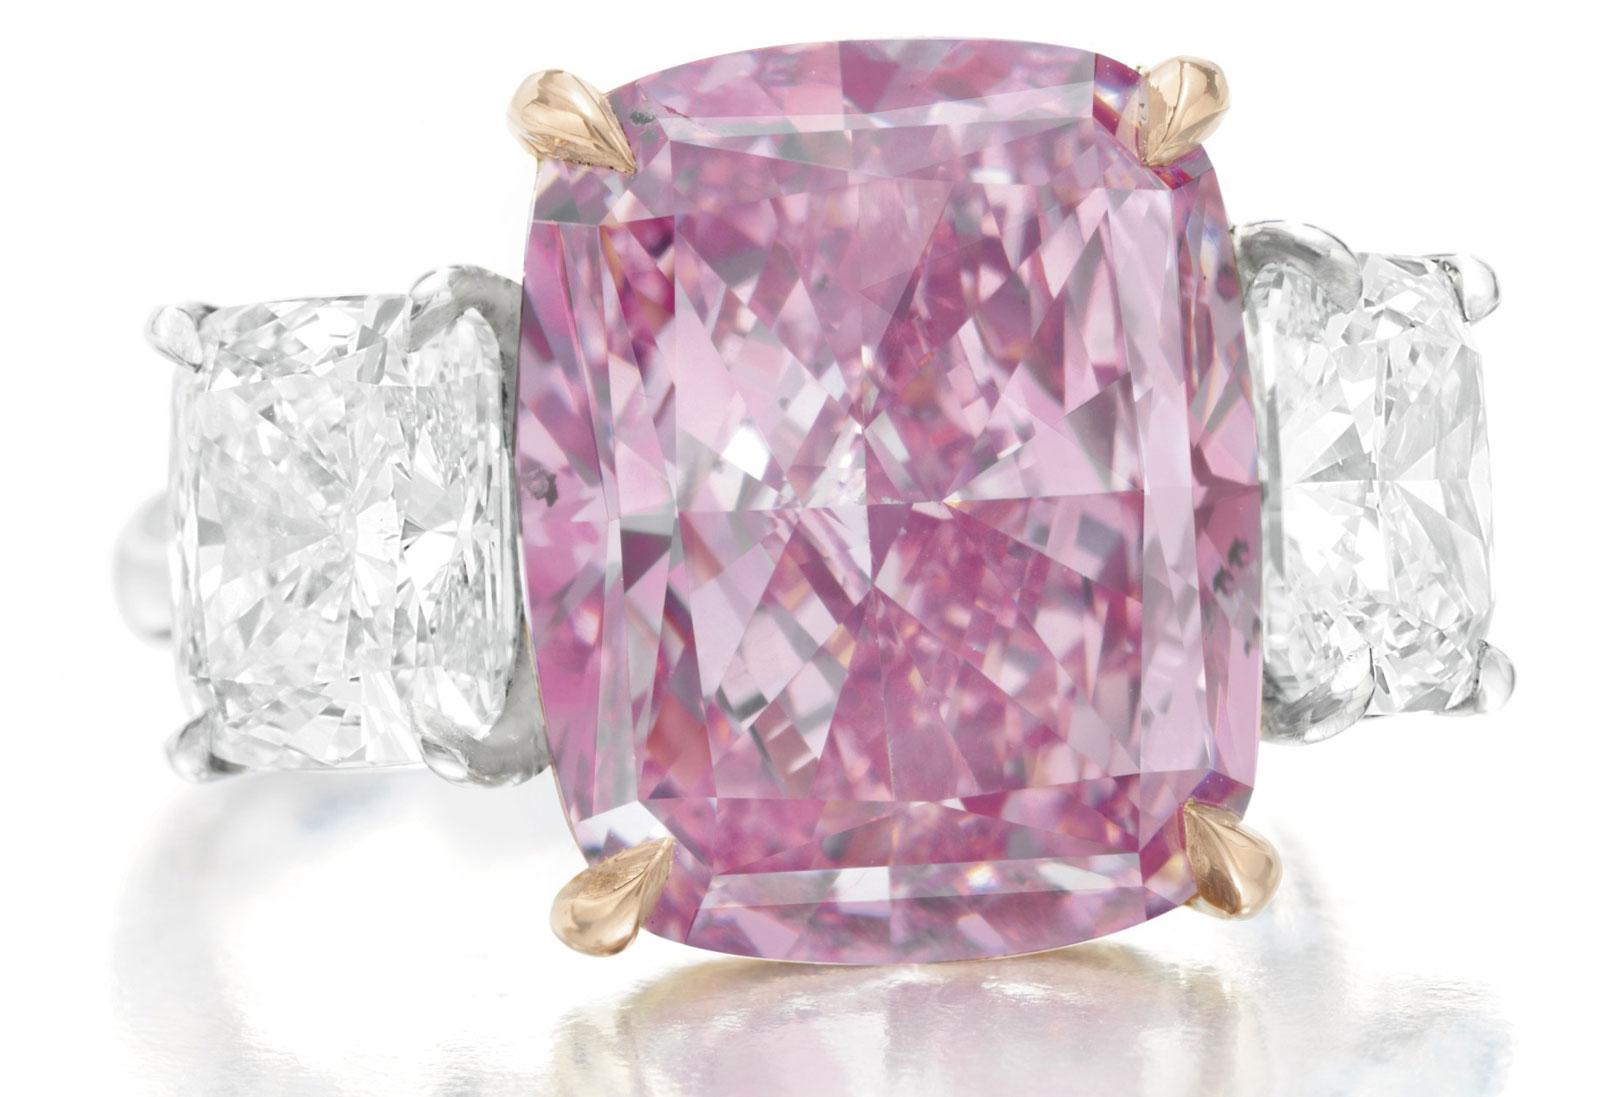 10.09 Carats Fancy Vivid Purple-Pink Cushion-Cut Diamond Ring